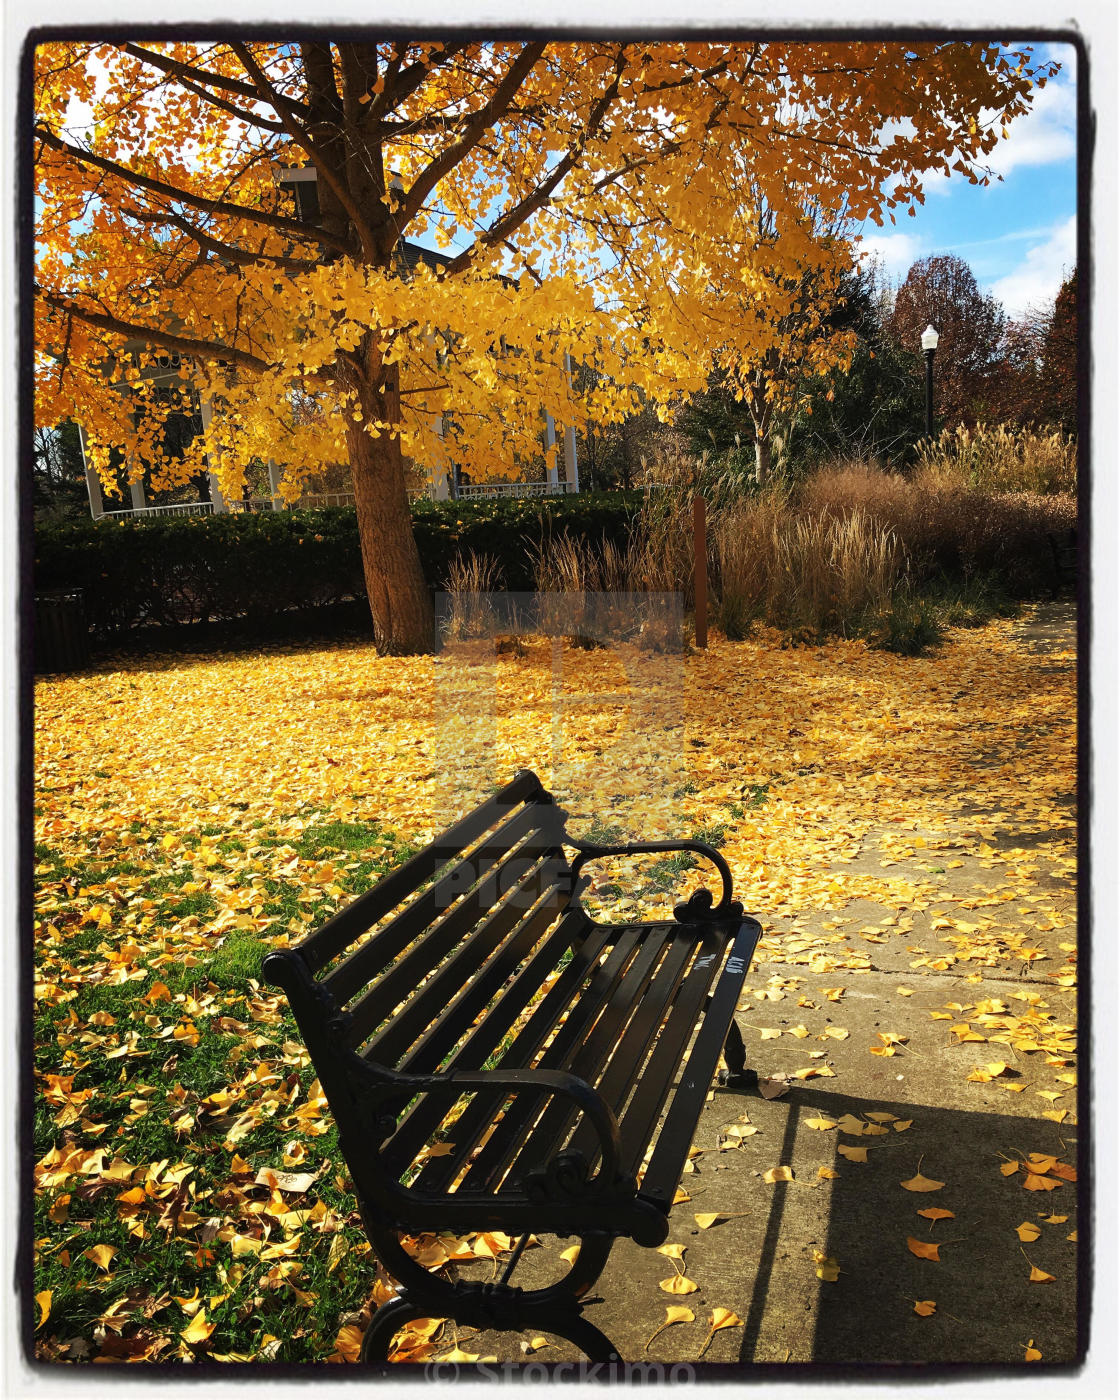 Pleasant Black Park Bench With Yellow Ginkgo Goodale Park Columbus Creativecarmelina Interior Chair Design Creativecarmelinacom